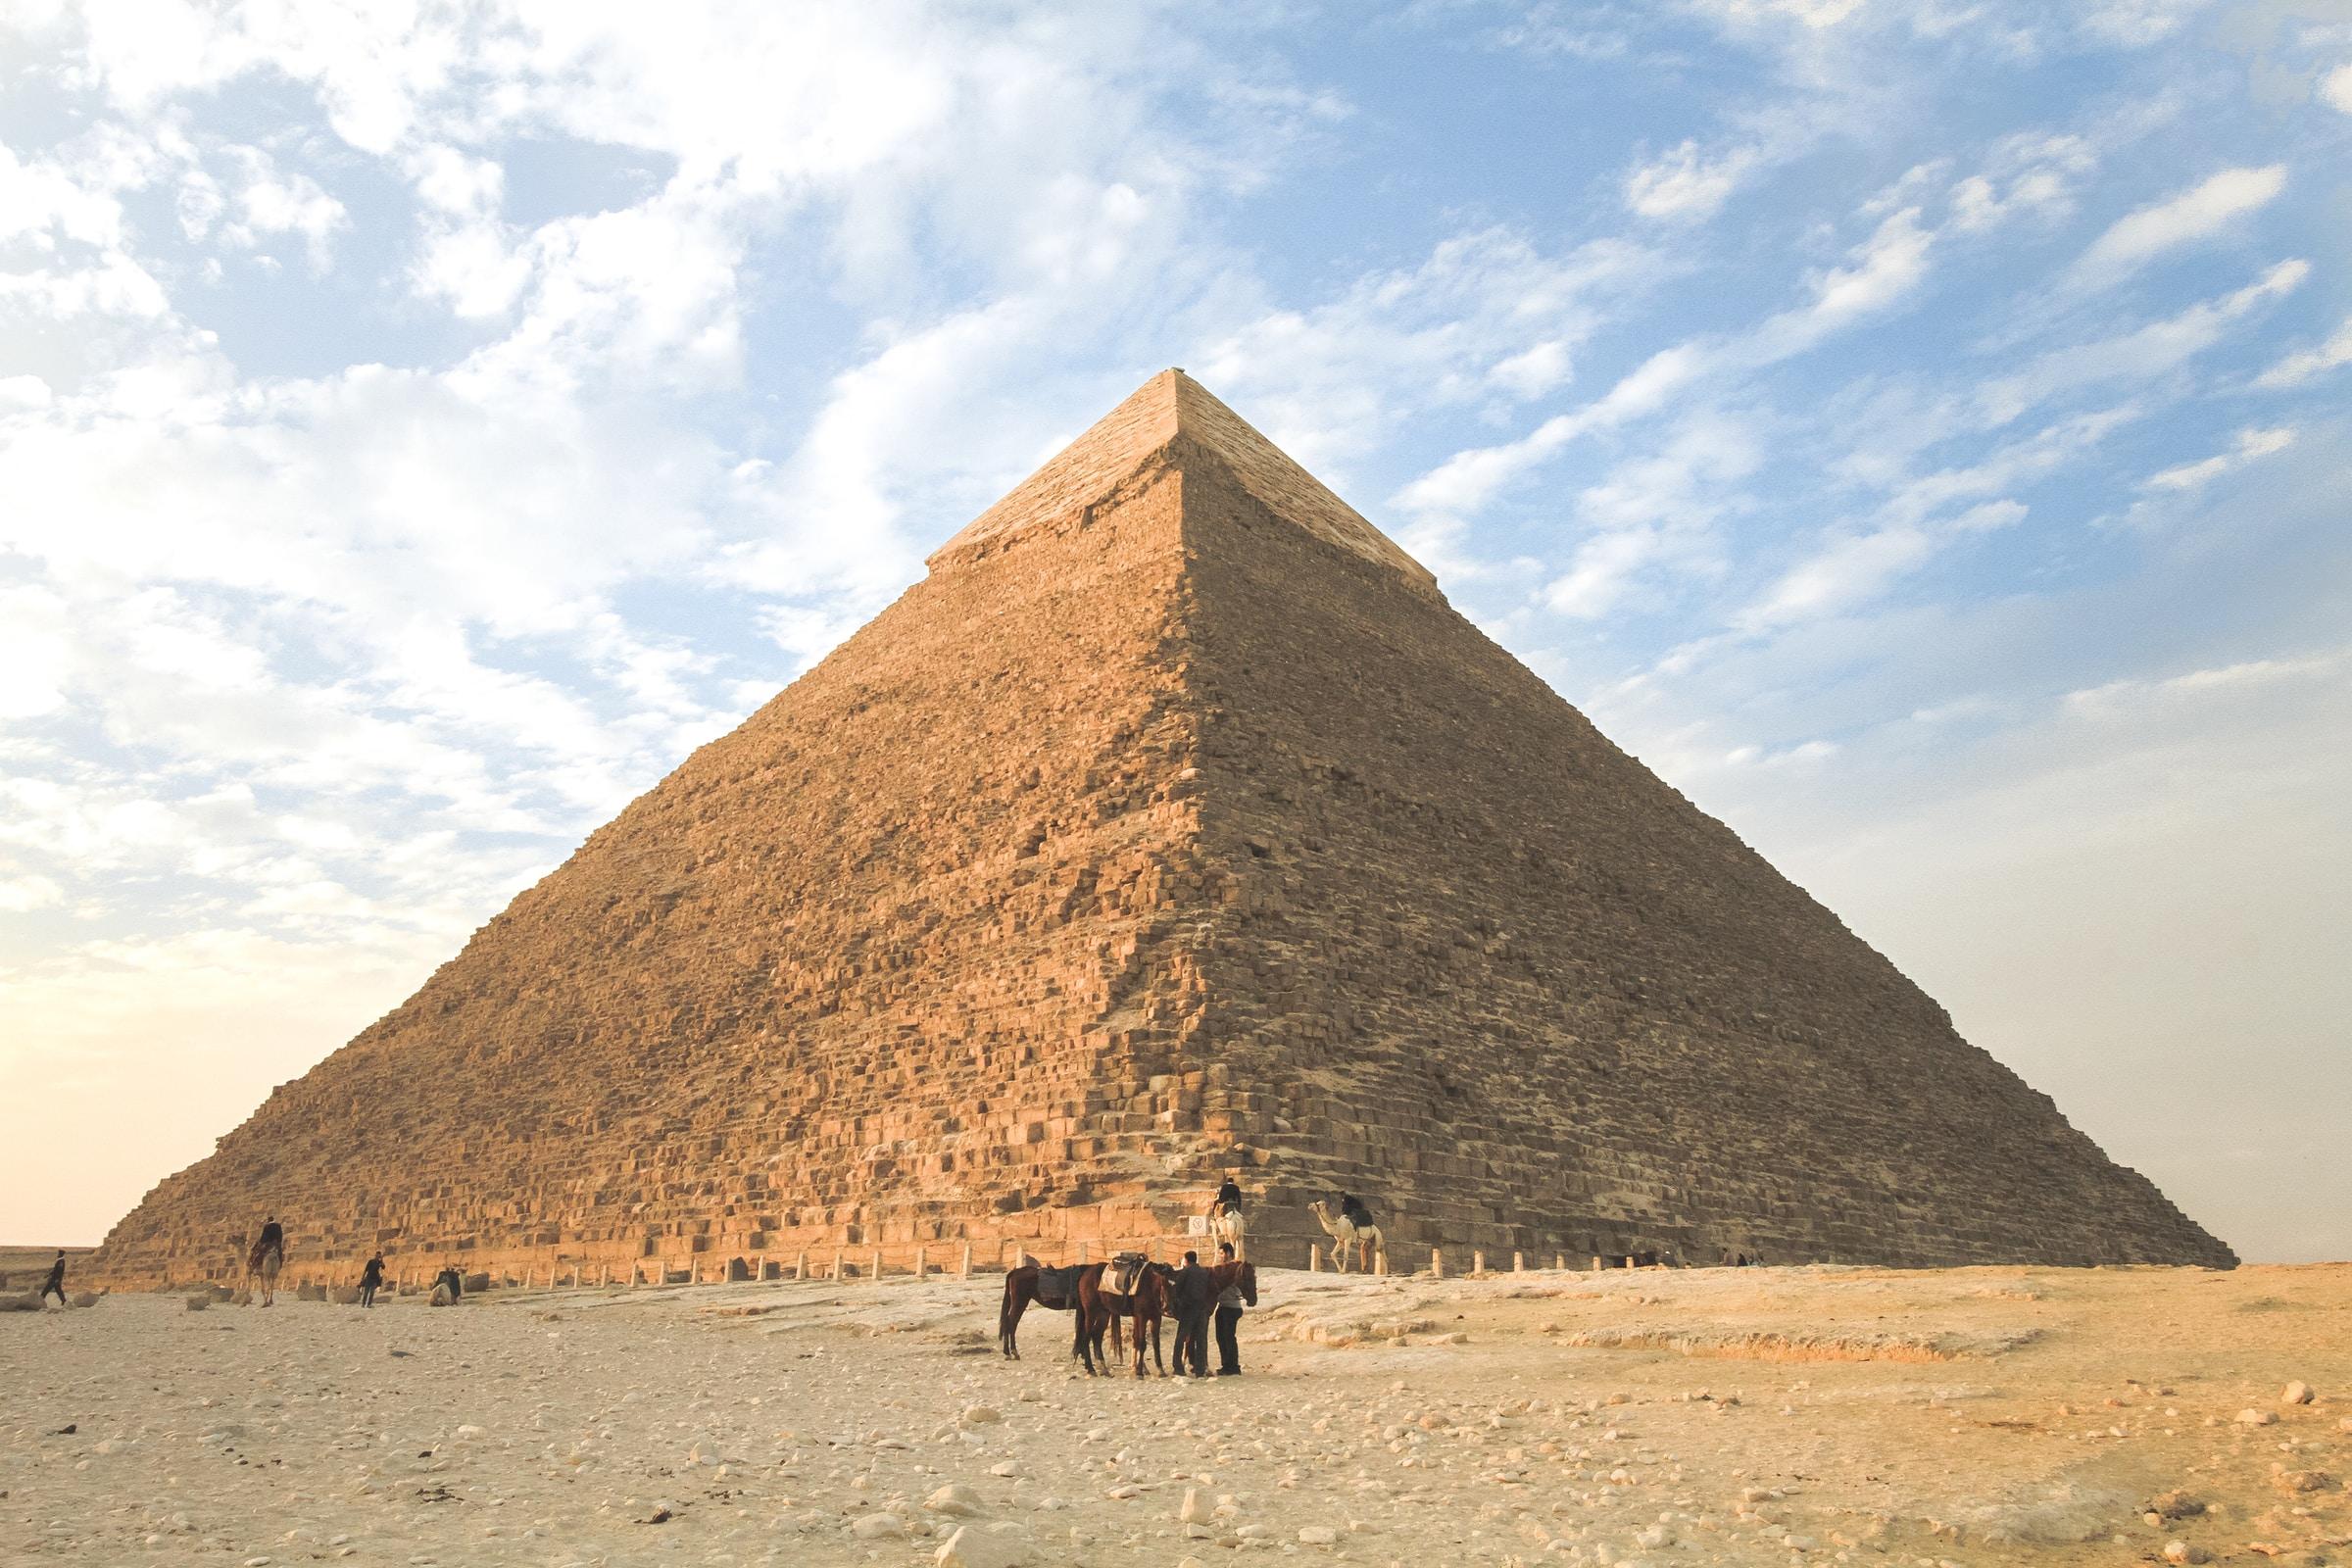 Pyramid of Khafre